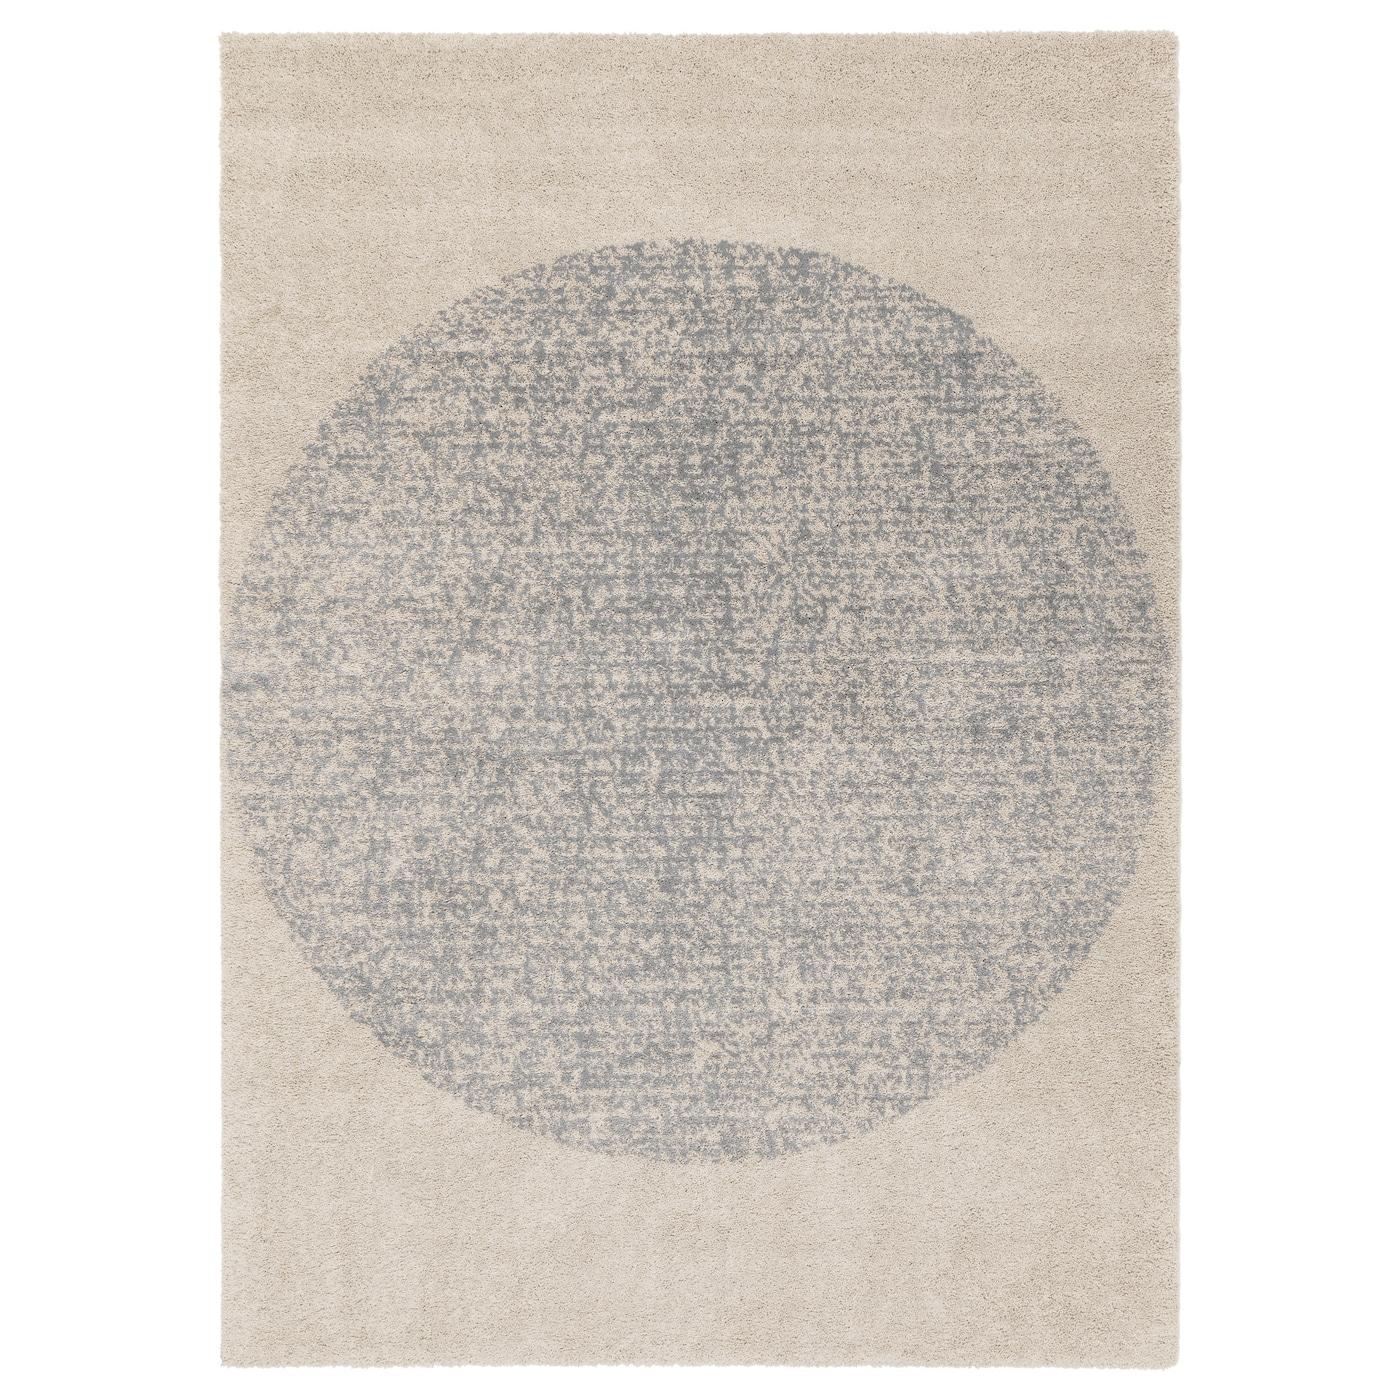 Skarres alfombra pelo largo gris 170 x 240 cm ikea - Alfombra gris ikea ...